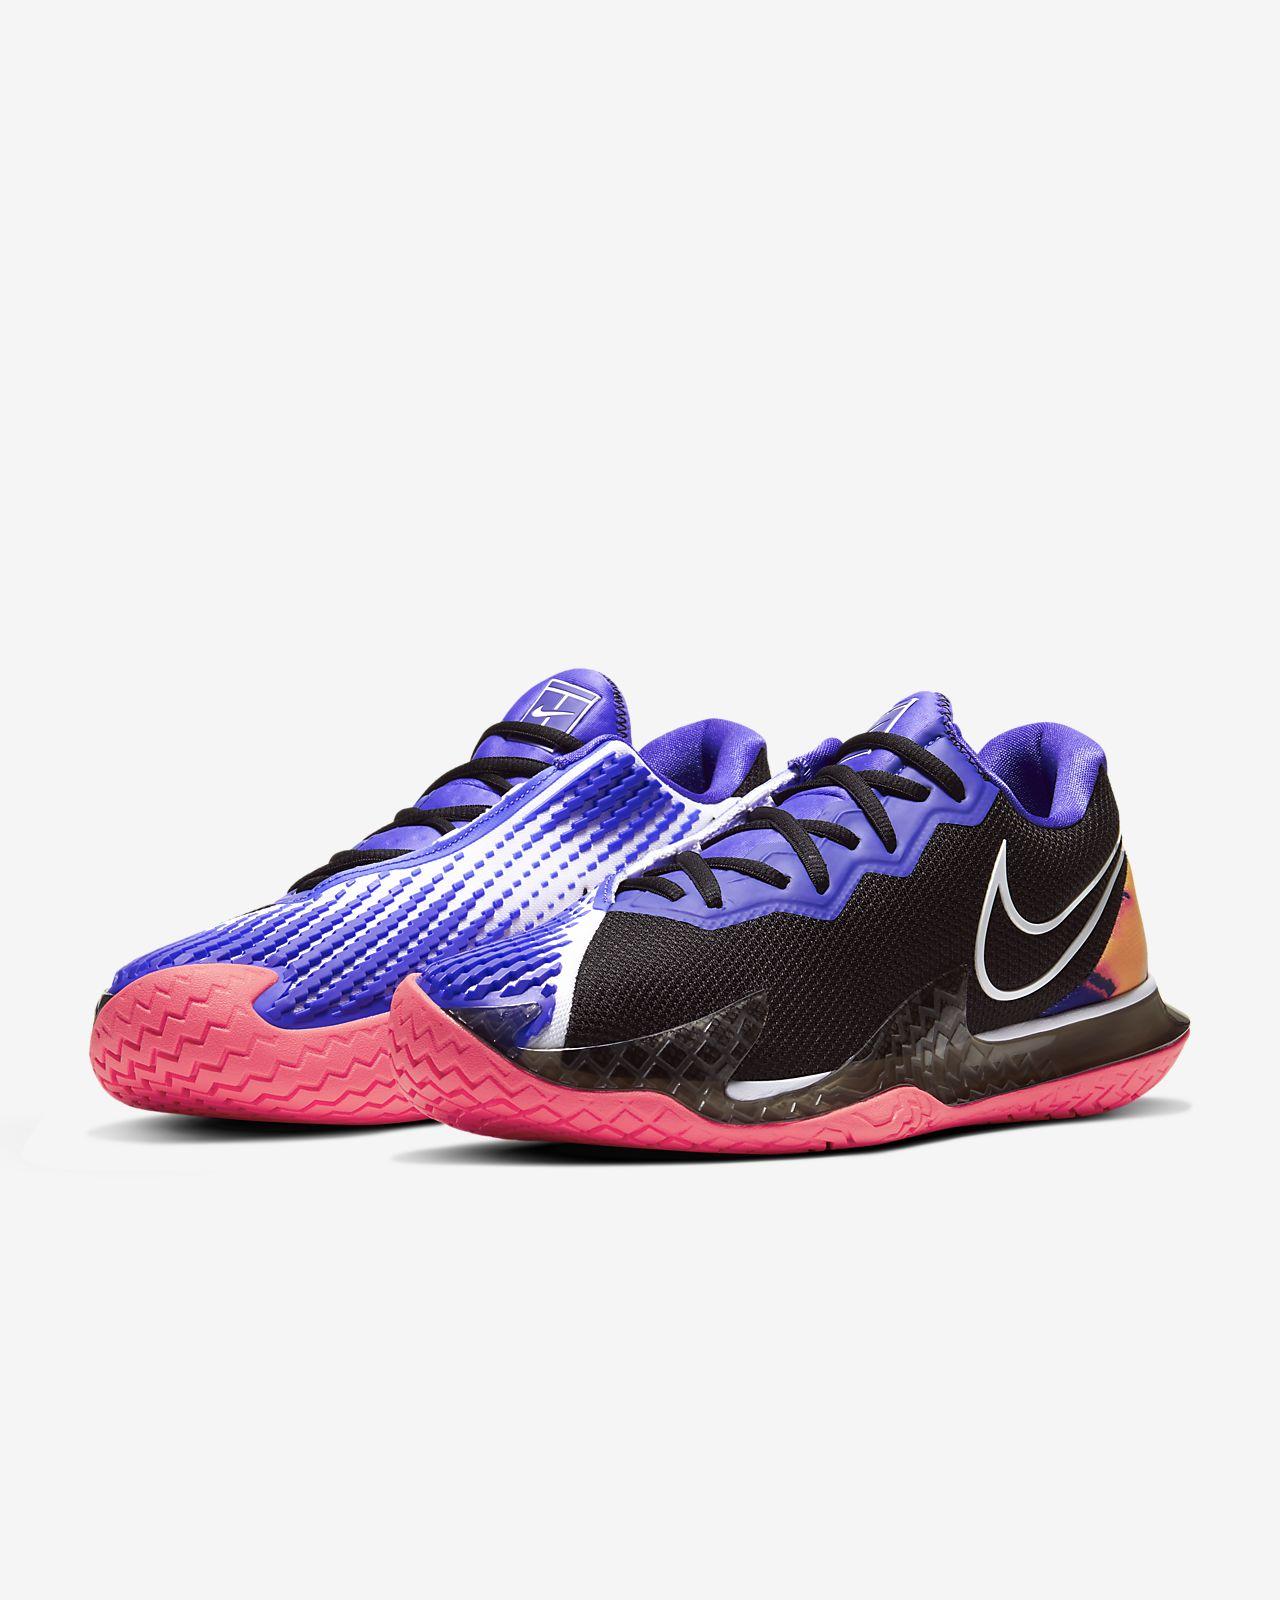 Nike Air Zoom Vapor Cage 4 Uomo Recensioni e Prezzi  TCqsPg